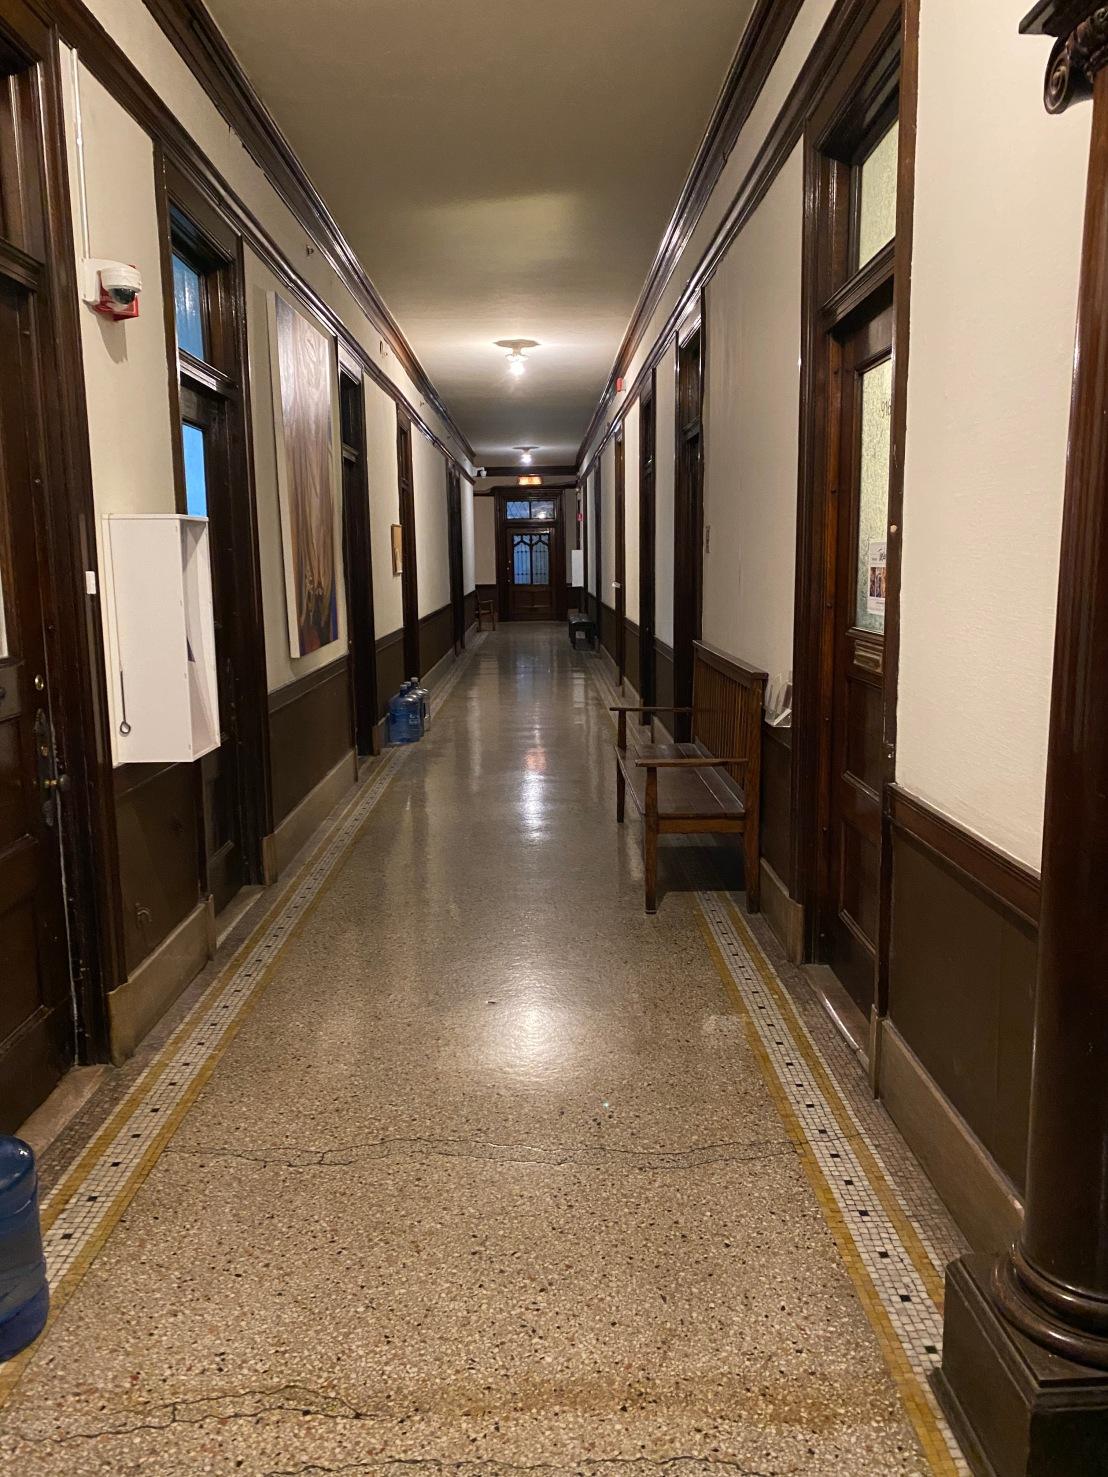 Hallway_ninth_floor_Fine_Arts_Building_Chicago